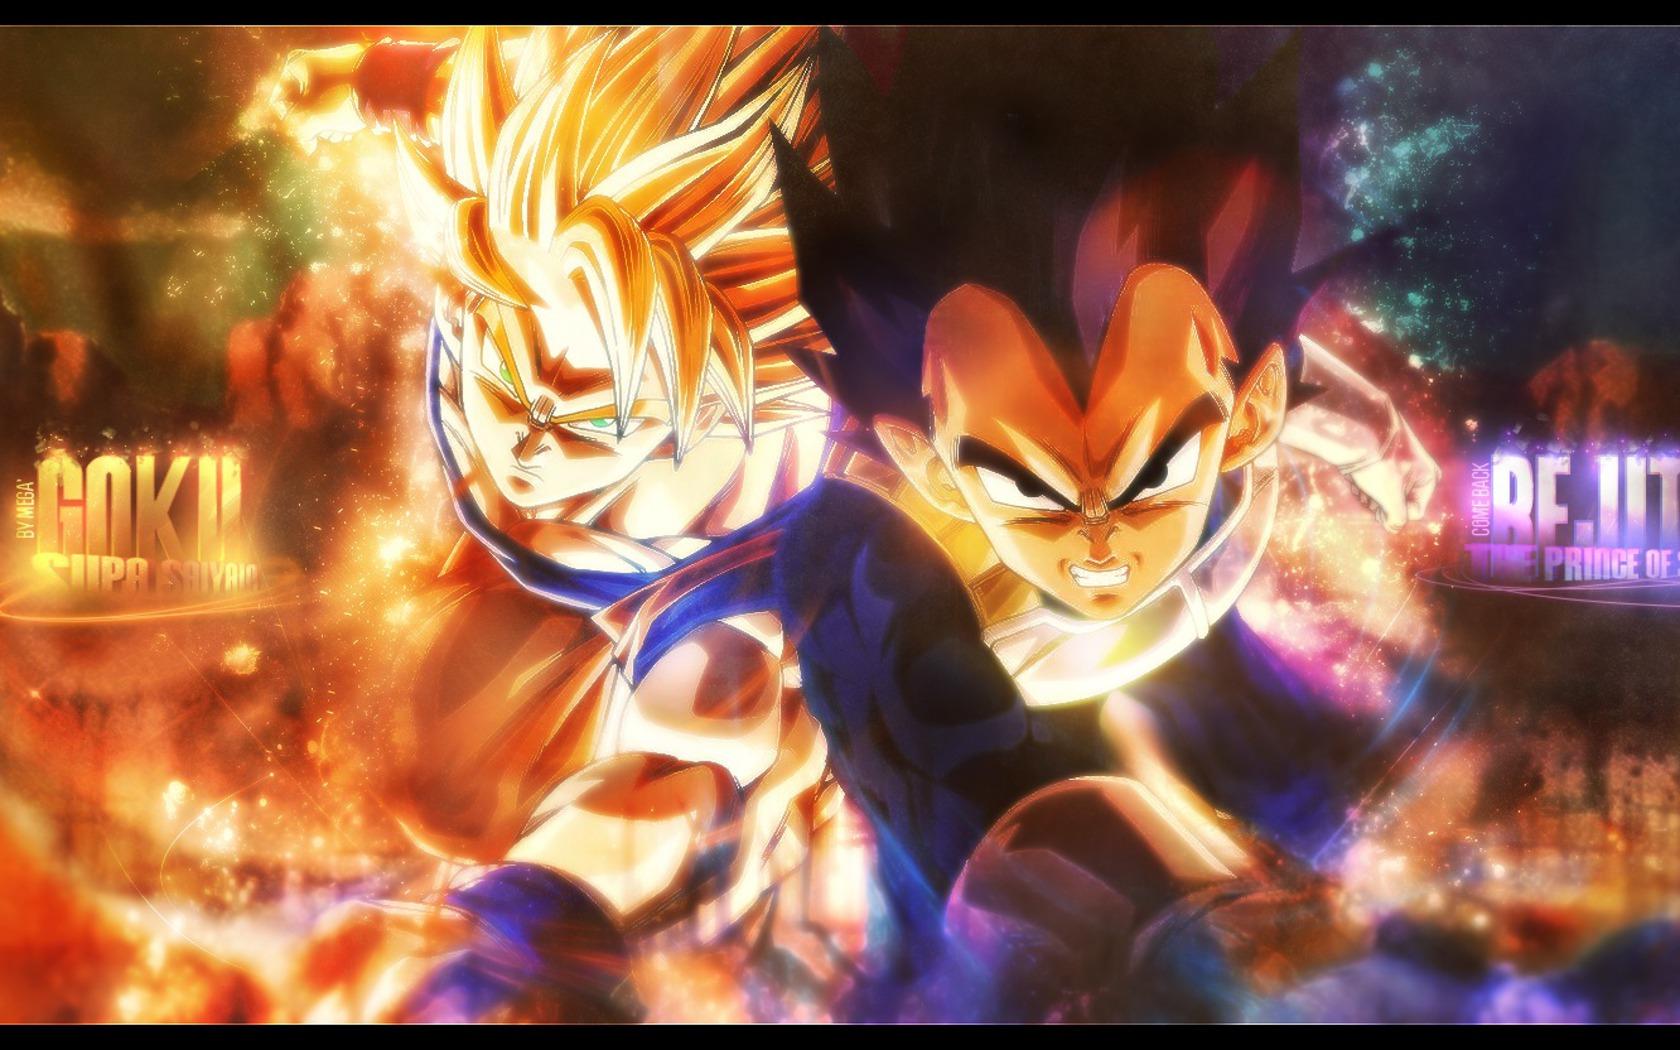 Free Download Vegeta Son Wallpaper 1680x1050 Vegeta Son Goku Goku Dragon Ball 1680x1050 For Your Desktop Mobile Tablet Explore 49 Dbz Wallpaper Goku And Vegeta Dragon Ball Z Goku